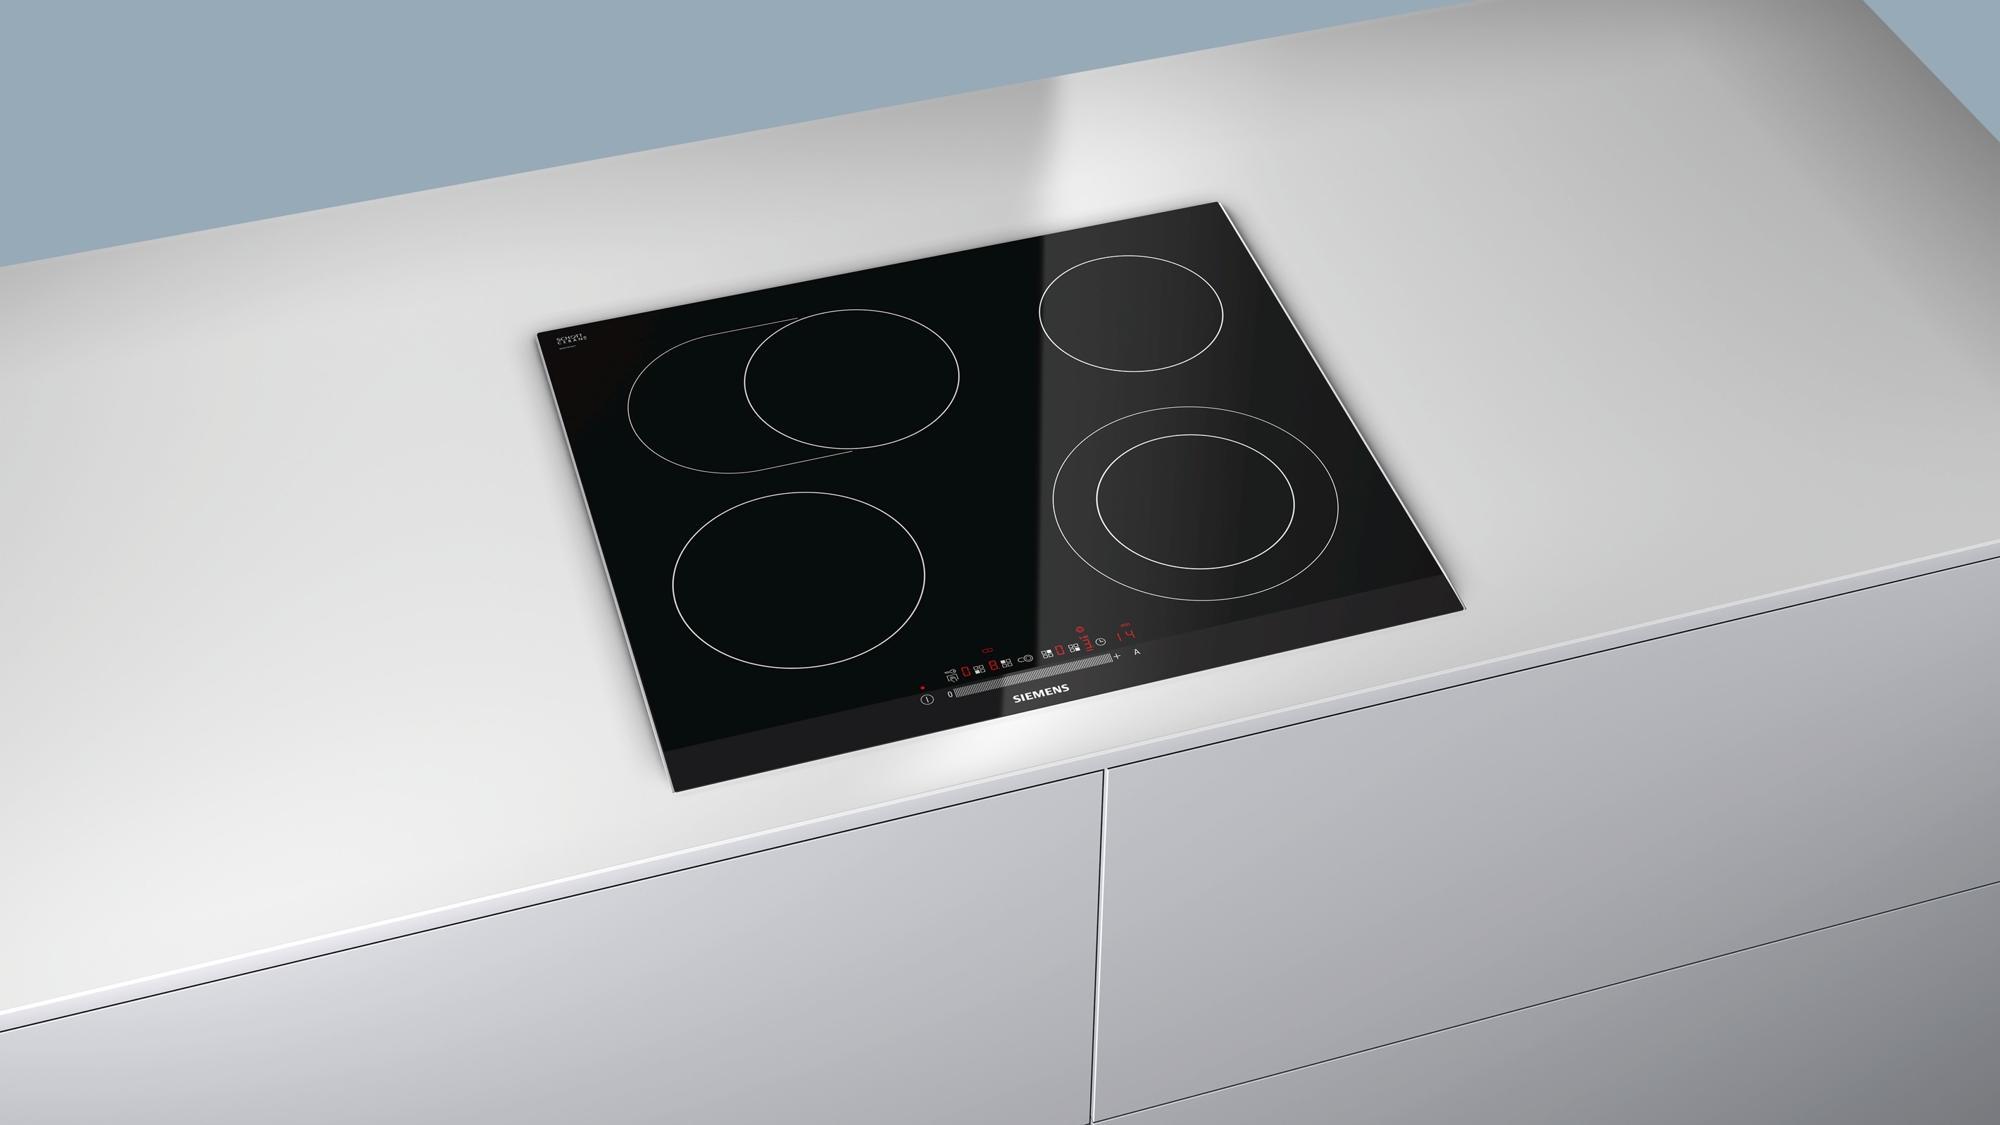 siemens et675fn17e autarkes elektro kochfeld glaskeramik 60 cm breit facetten design sensor. Black Bedroom Furniture Sets. Home Design Ideas